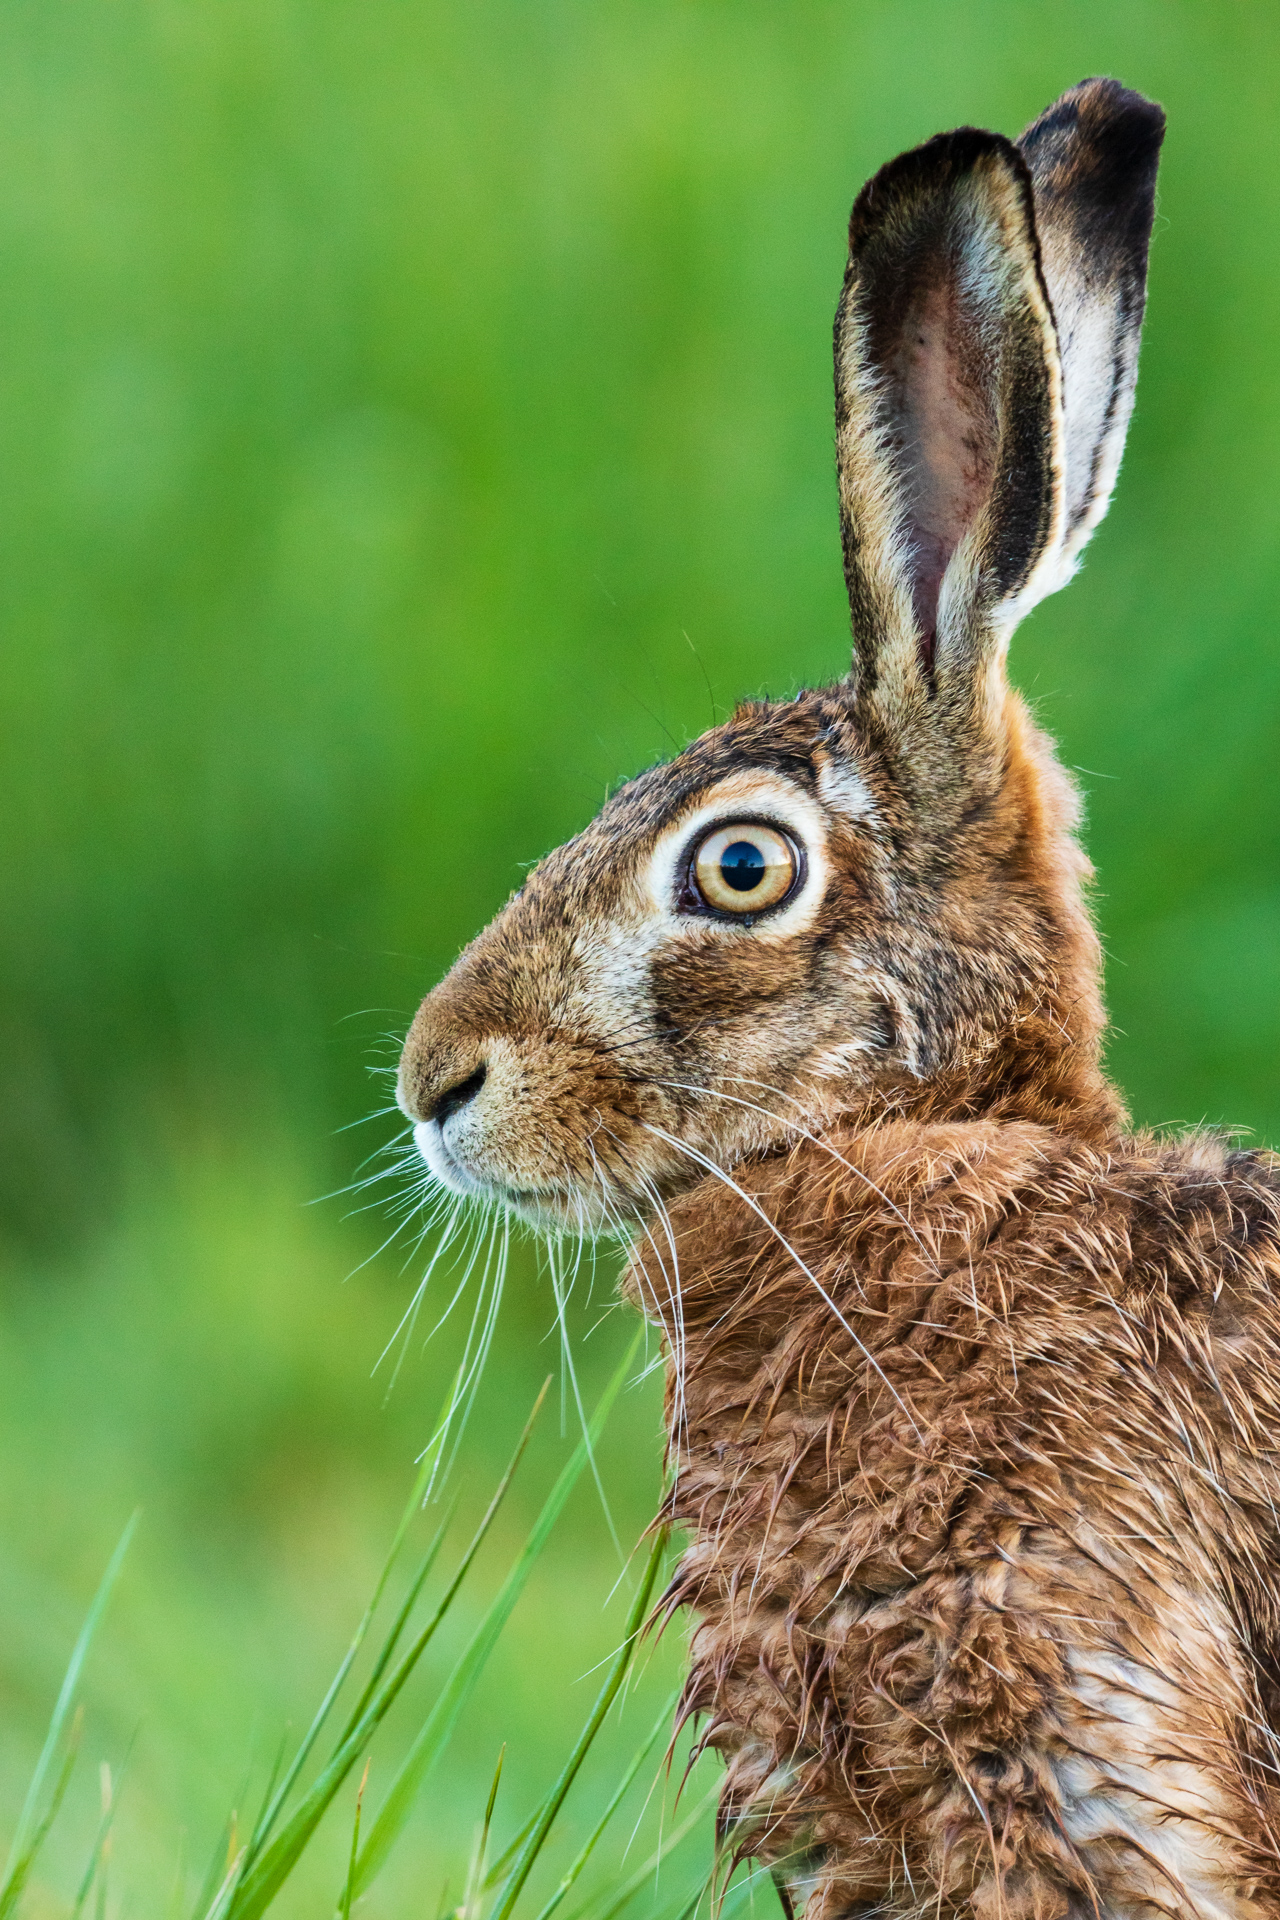 Porträt eines Feldhasen (Lepus europaeus) / Foto: Andreas Sebald